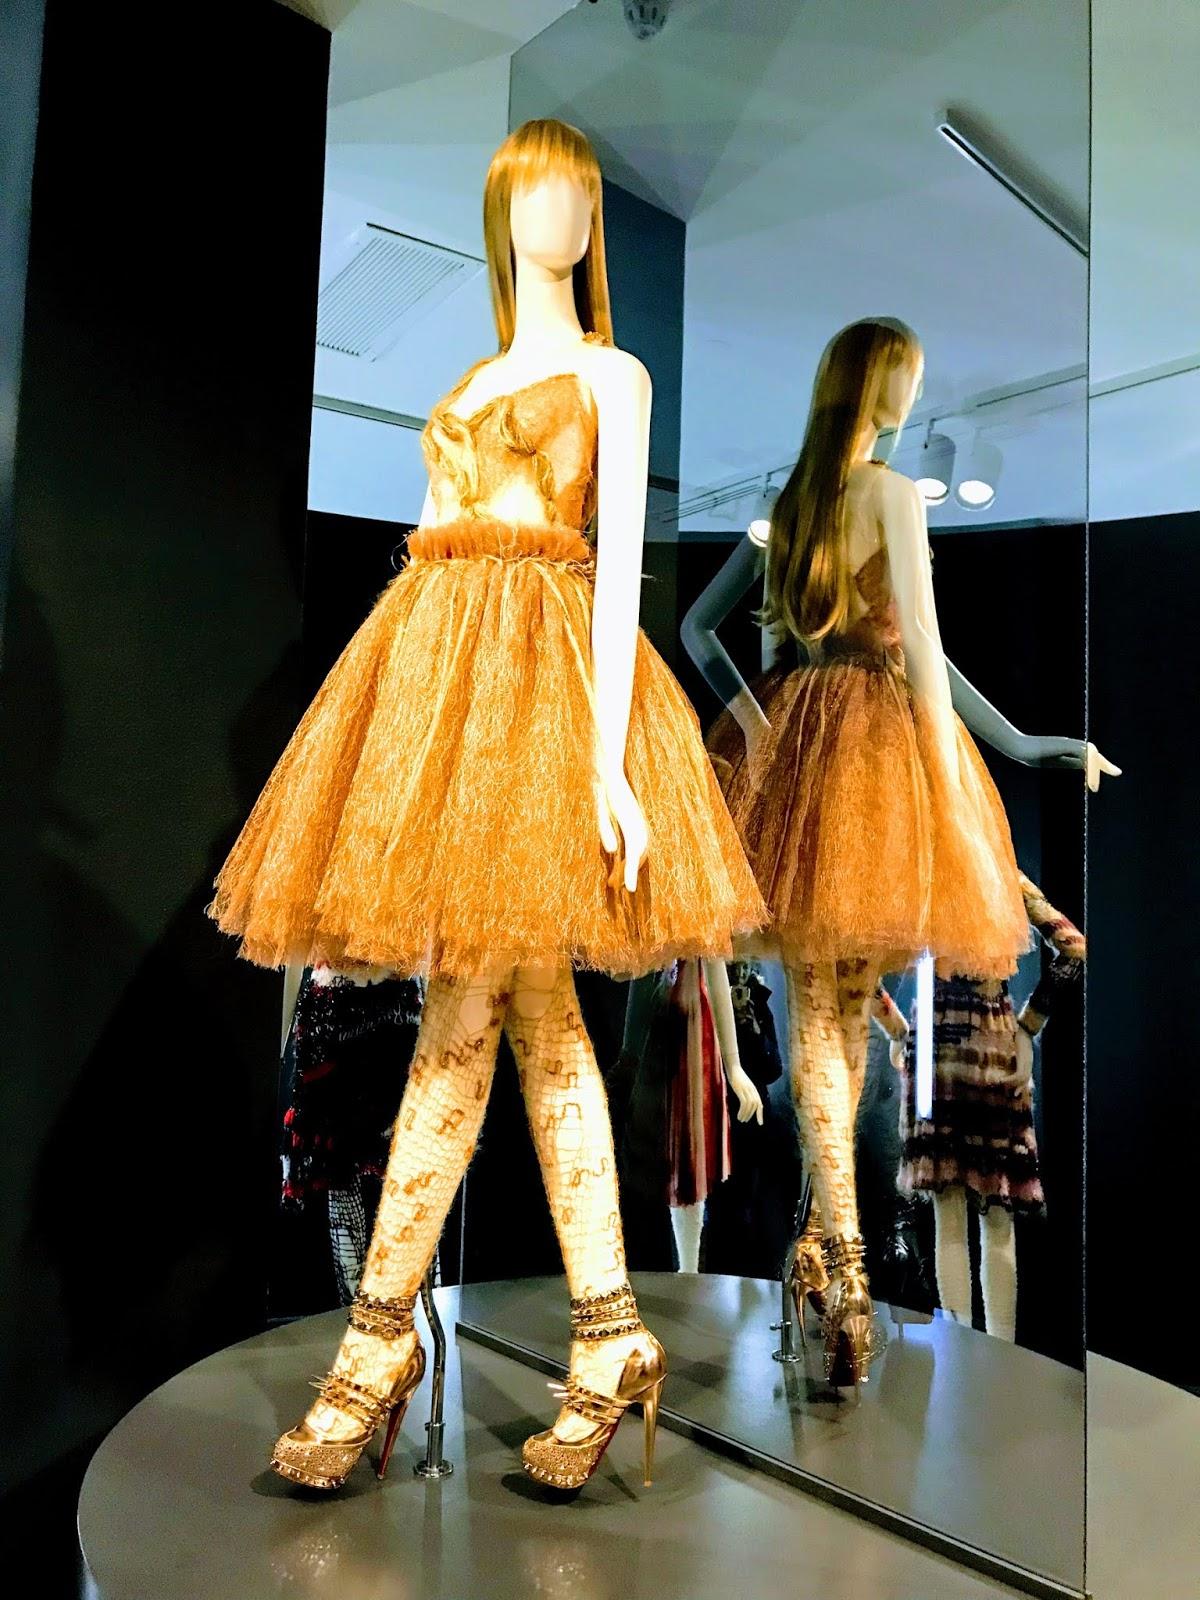 Ballet Led Dance Ballet Skirt Light Adult Children Skirt Costumes Crony Lamp Luminous Square Princess Dress To Adopt Advanced Technology Stage & Dance Wear